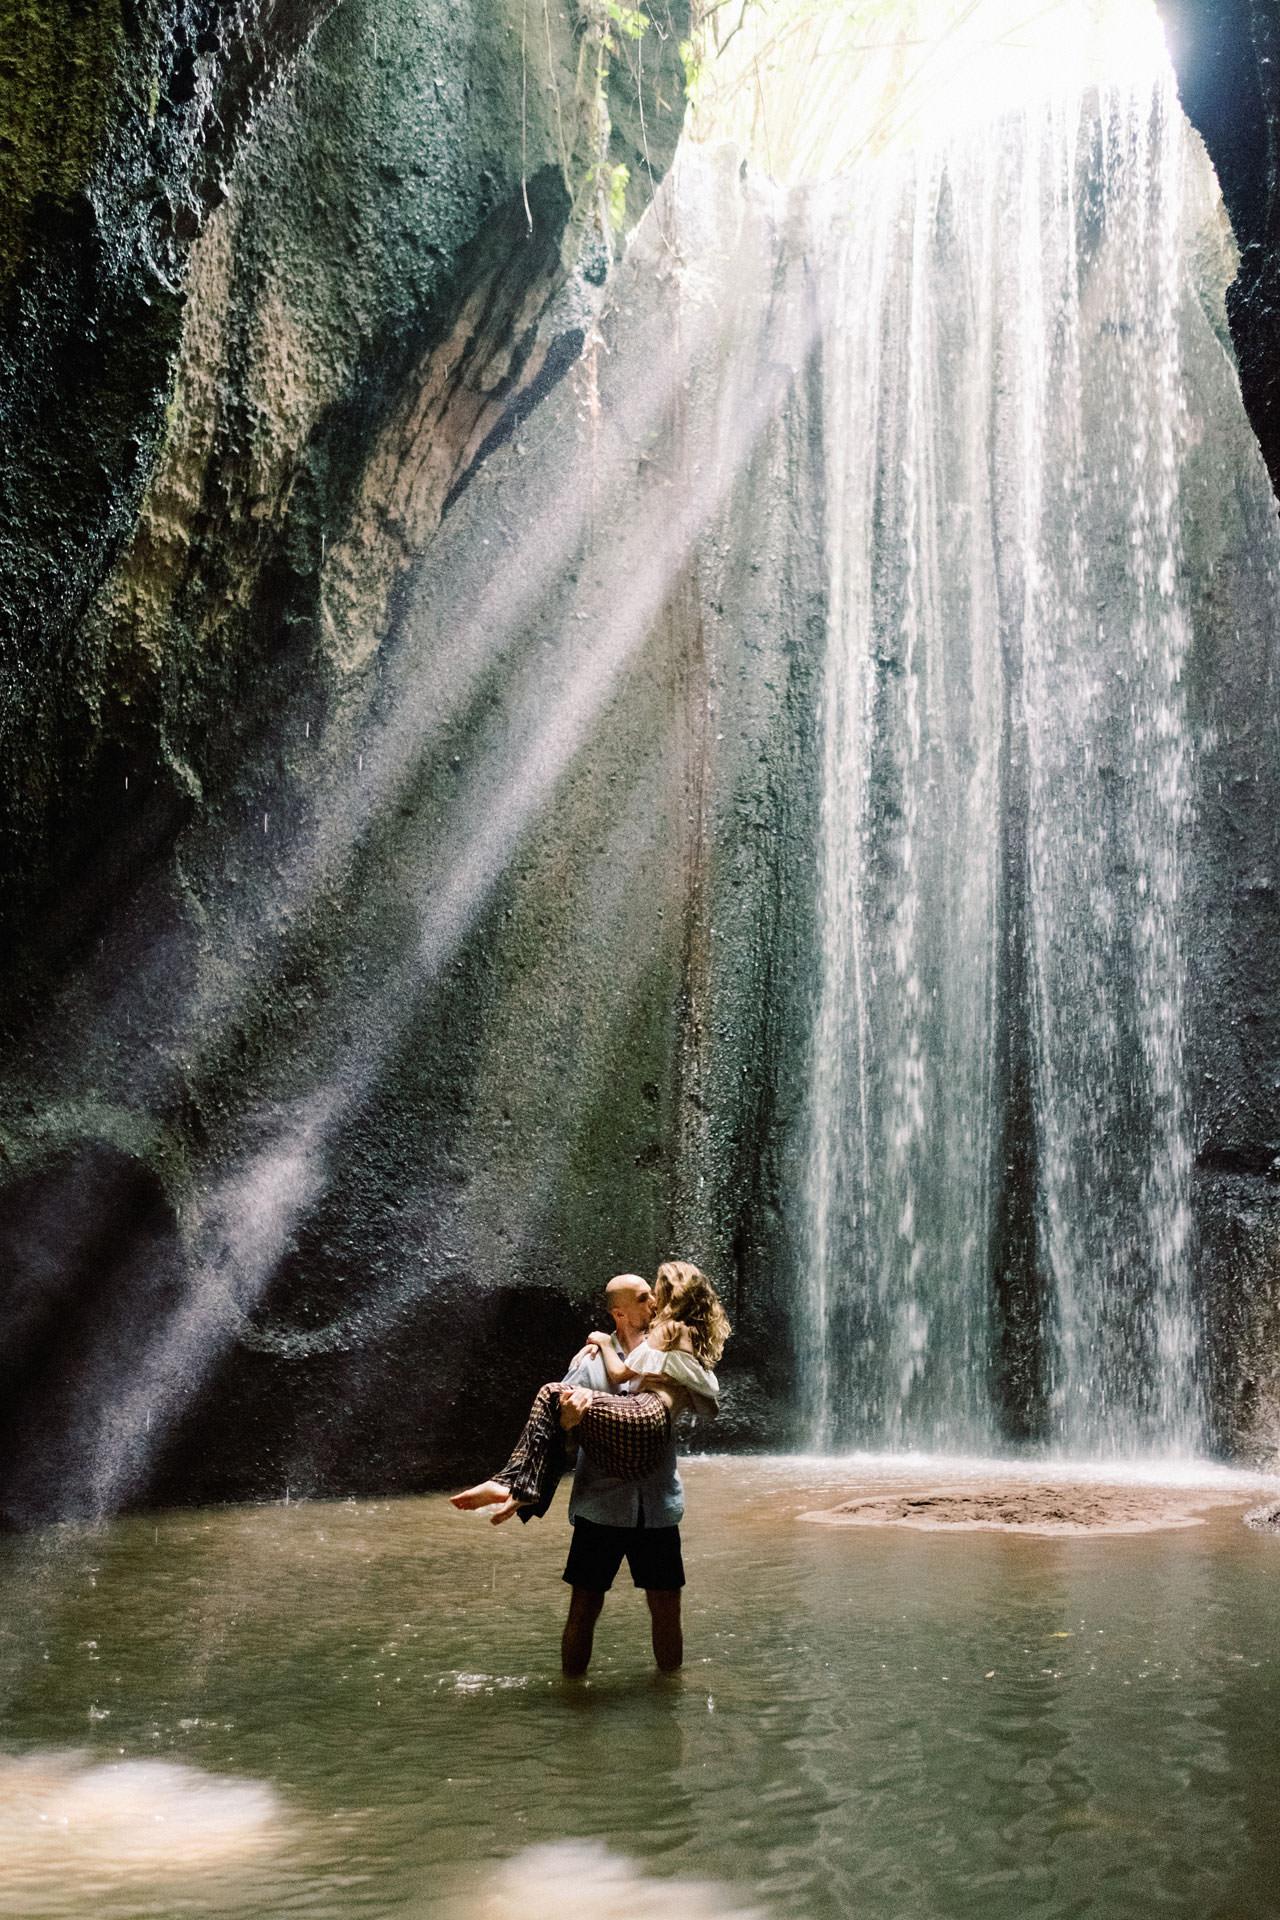 Tukad Cepung Waterfall Engagement